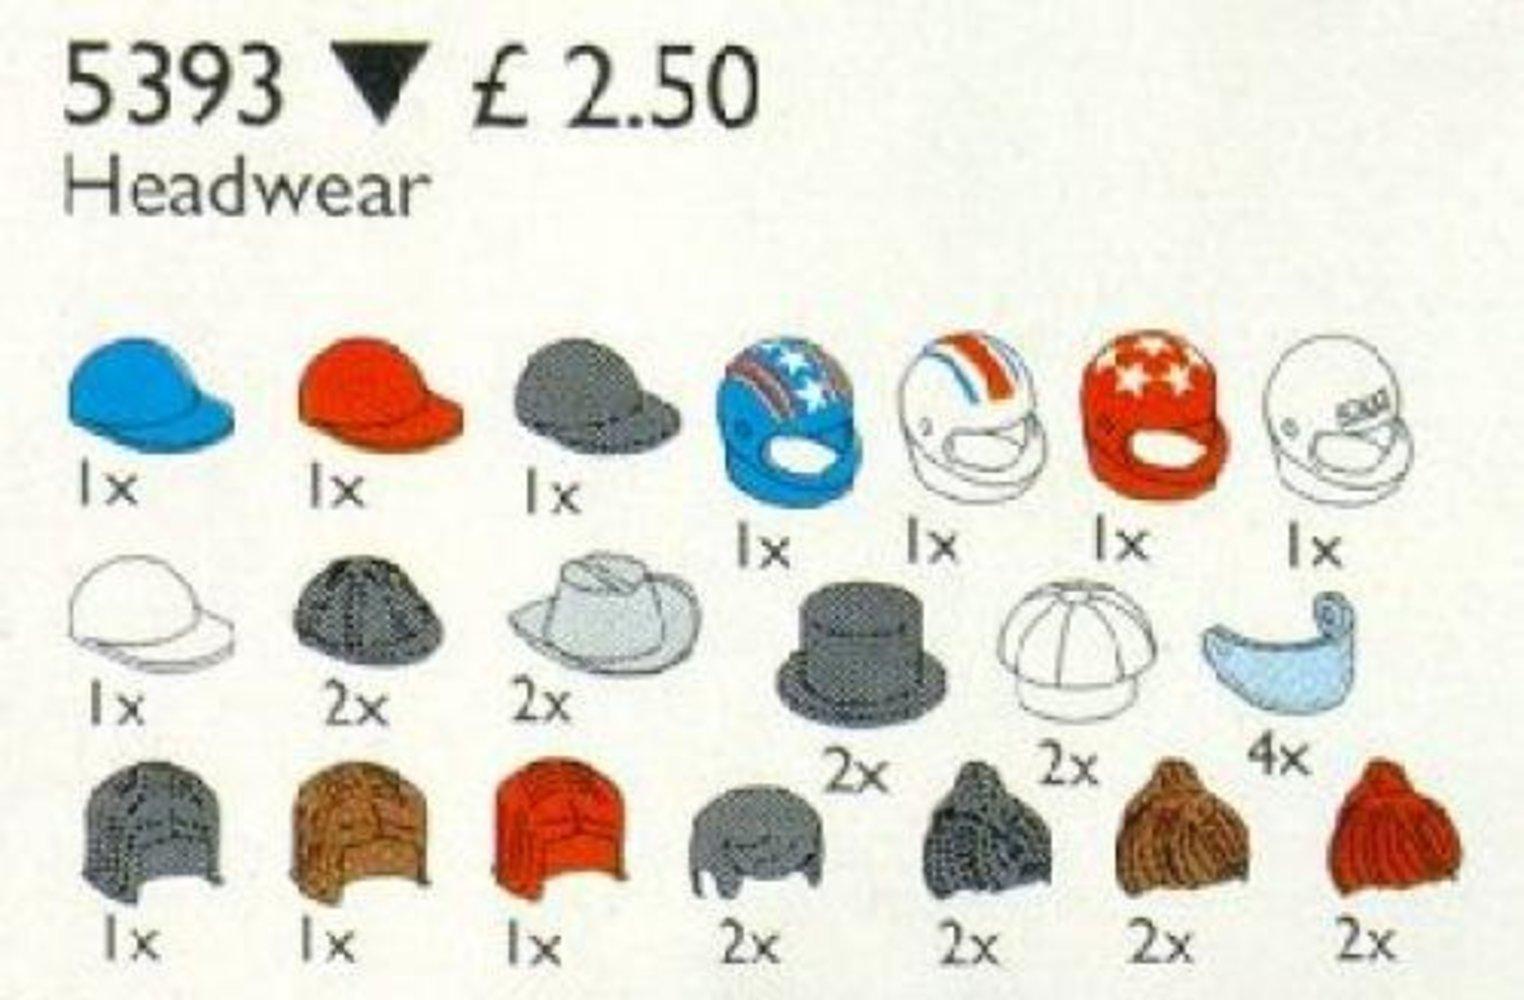 Headgear (Hats and Hair)